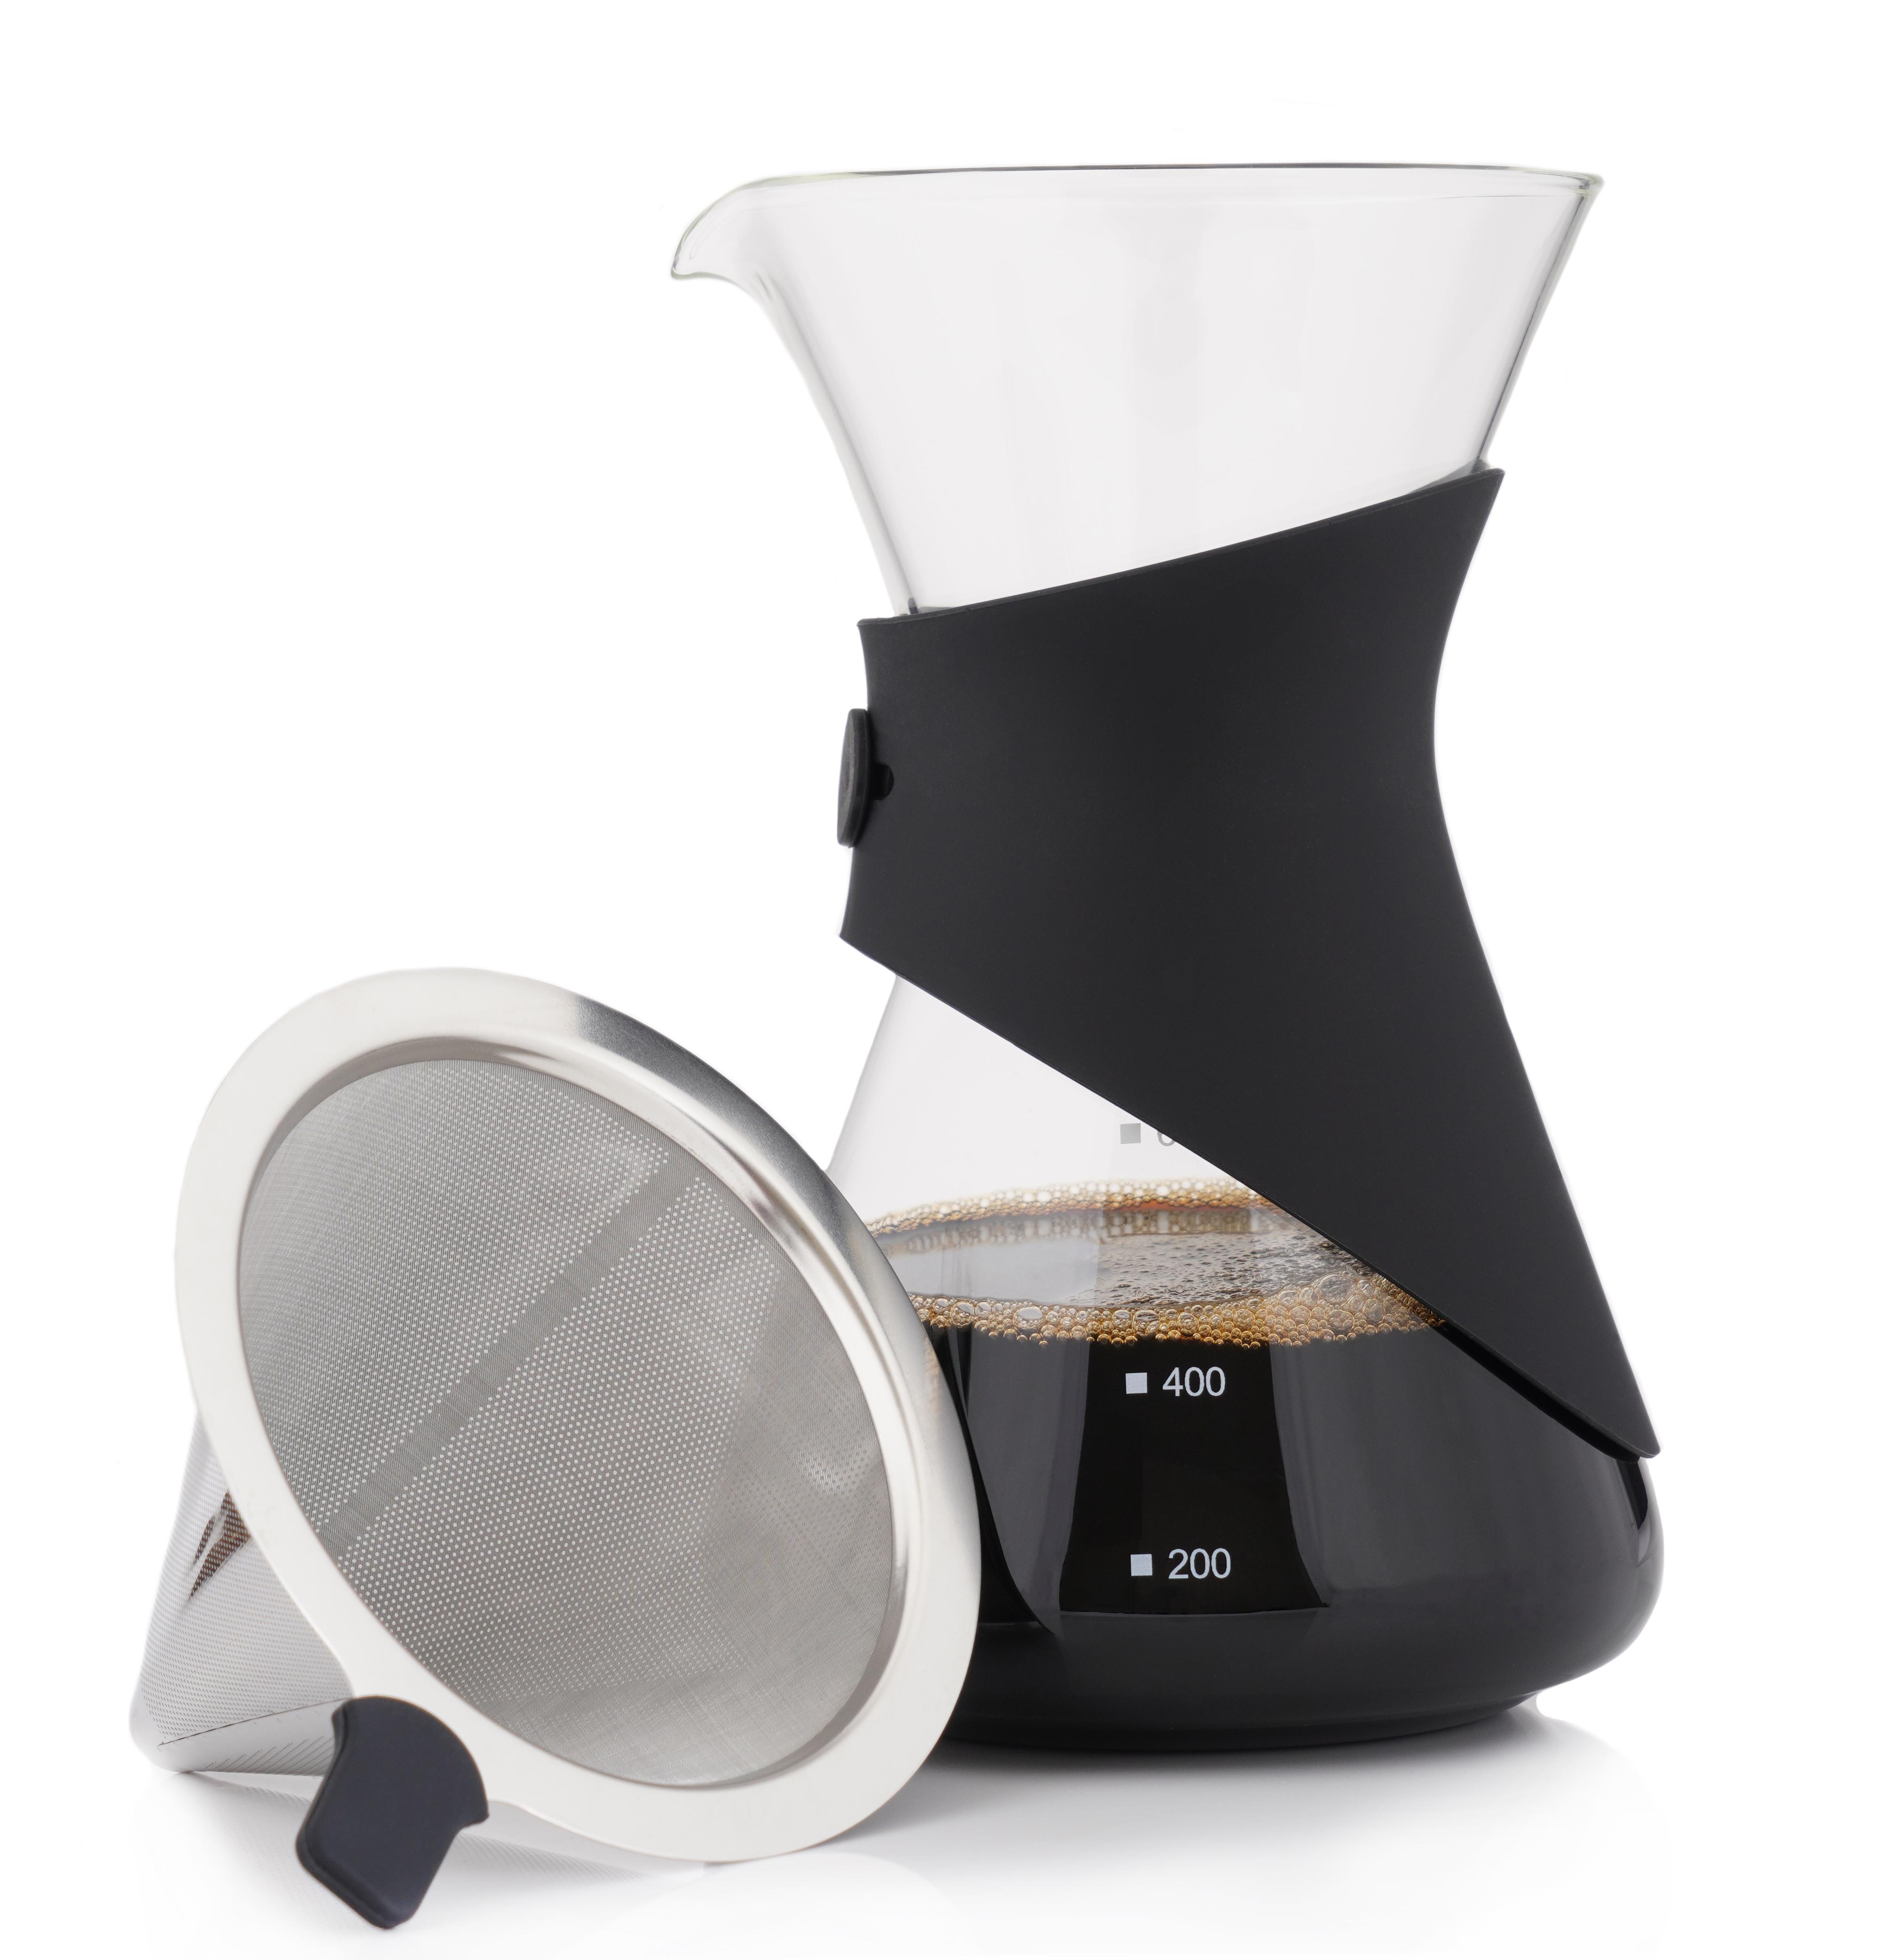 SAKI Pour Over Coffee Maker